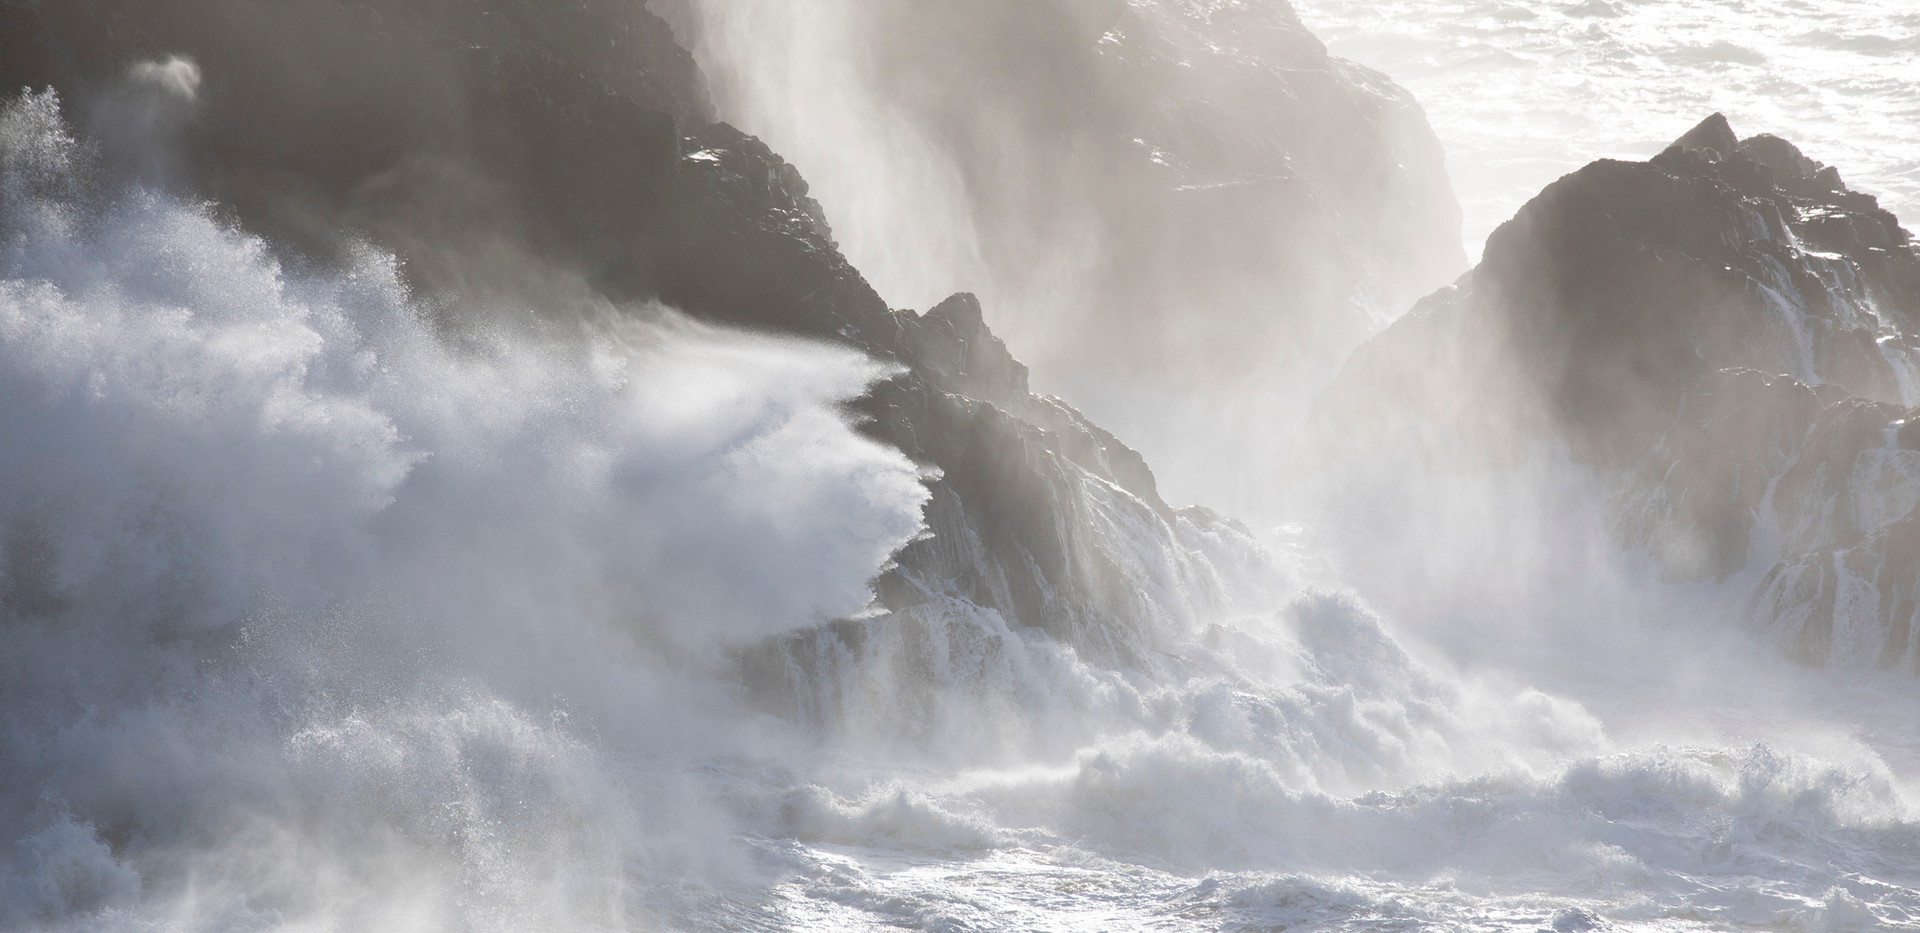 Cornwall-Feb2020-William Gray-4.JPG